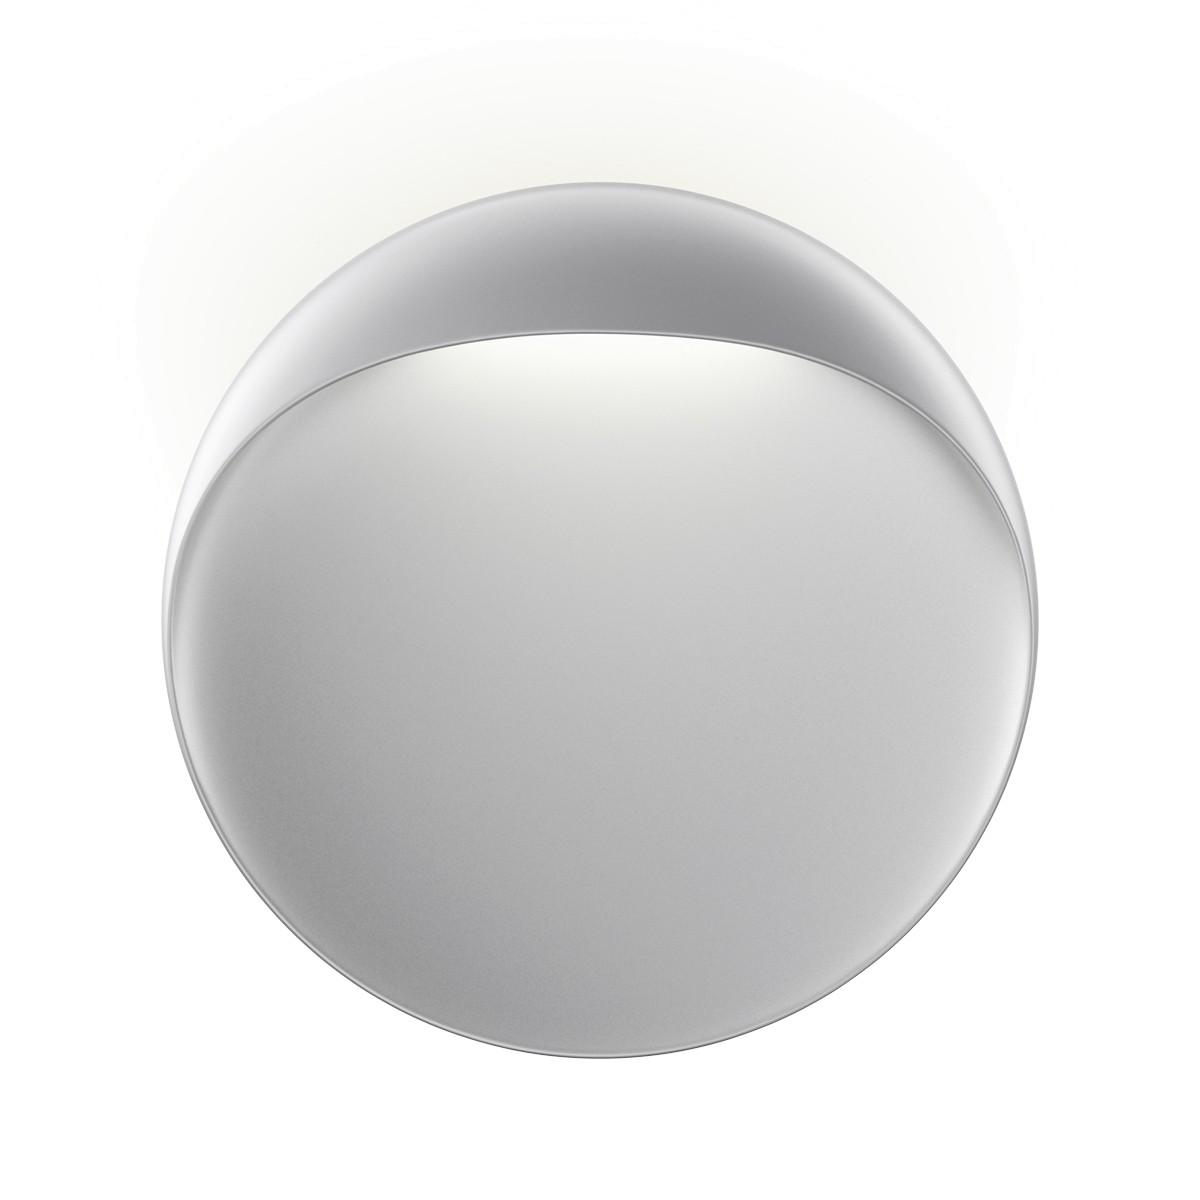 Louis Poulsen Flindt LED Wandleuchte, Ø: 40 cm, 2700 K, aluminiumfarben